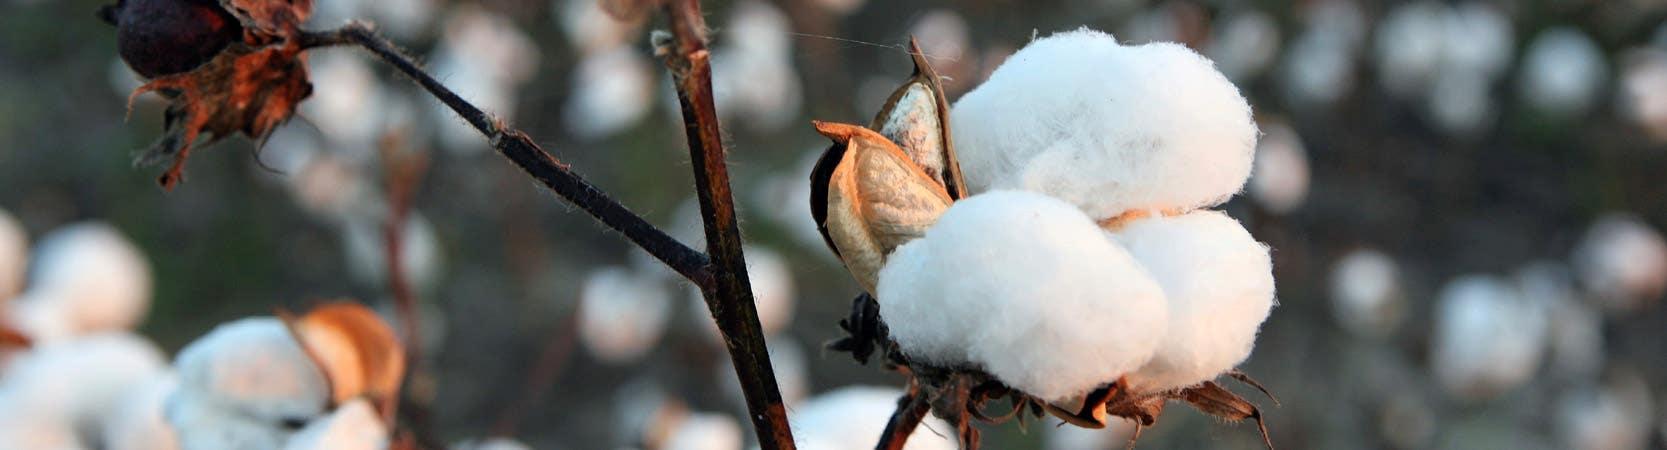 cotton mattresses